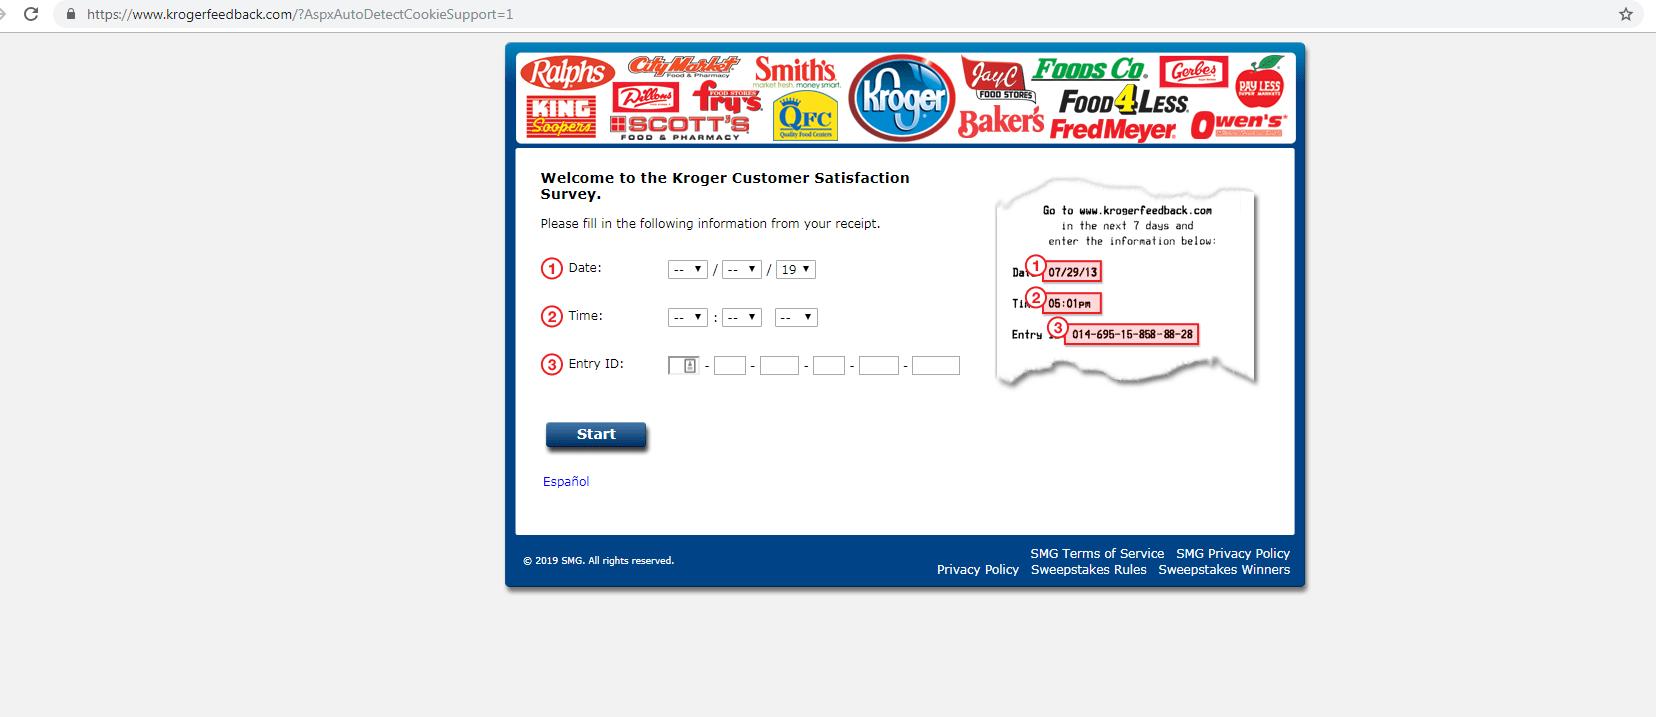 Survey Site: www.KrogerFeedback.com